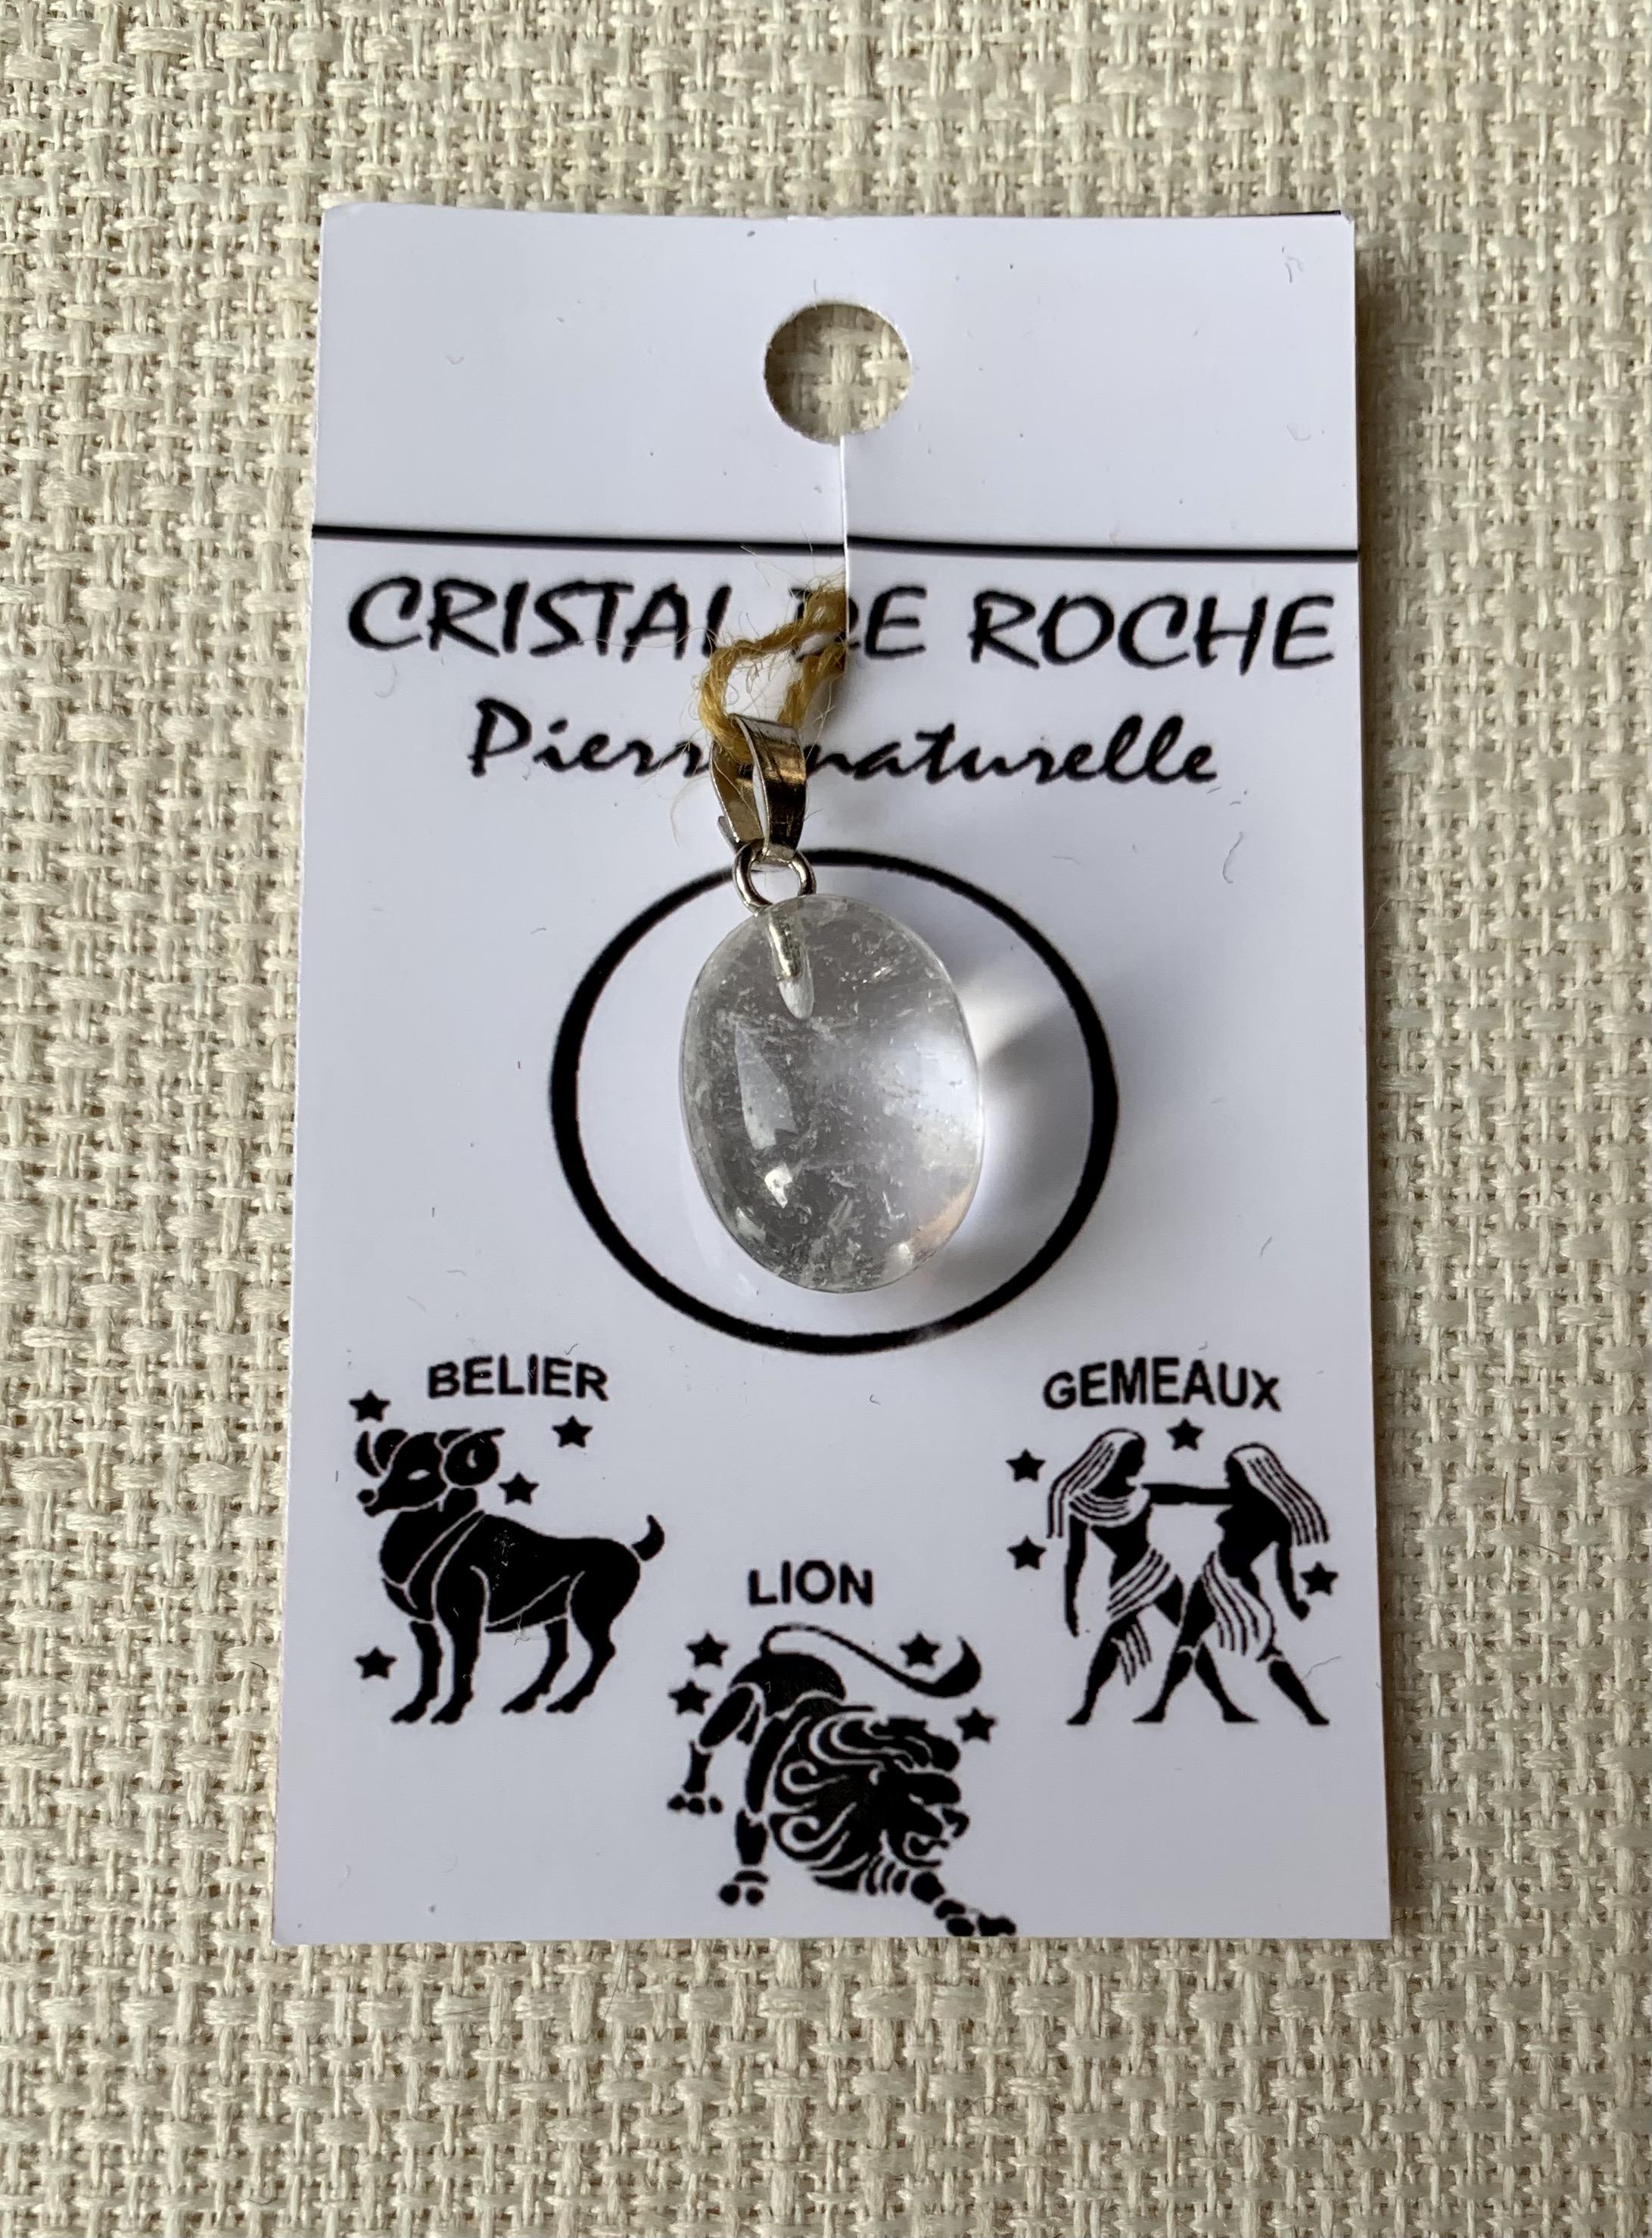 CRISTAL DE ROCHE 5 €